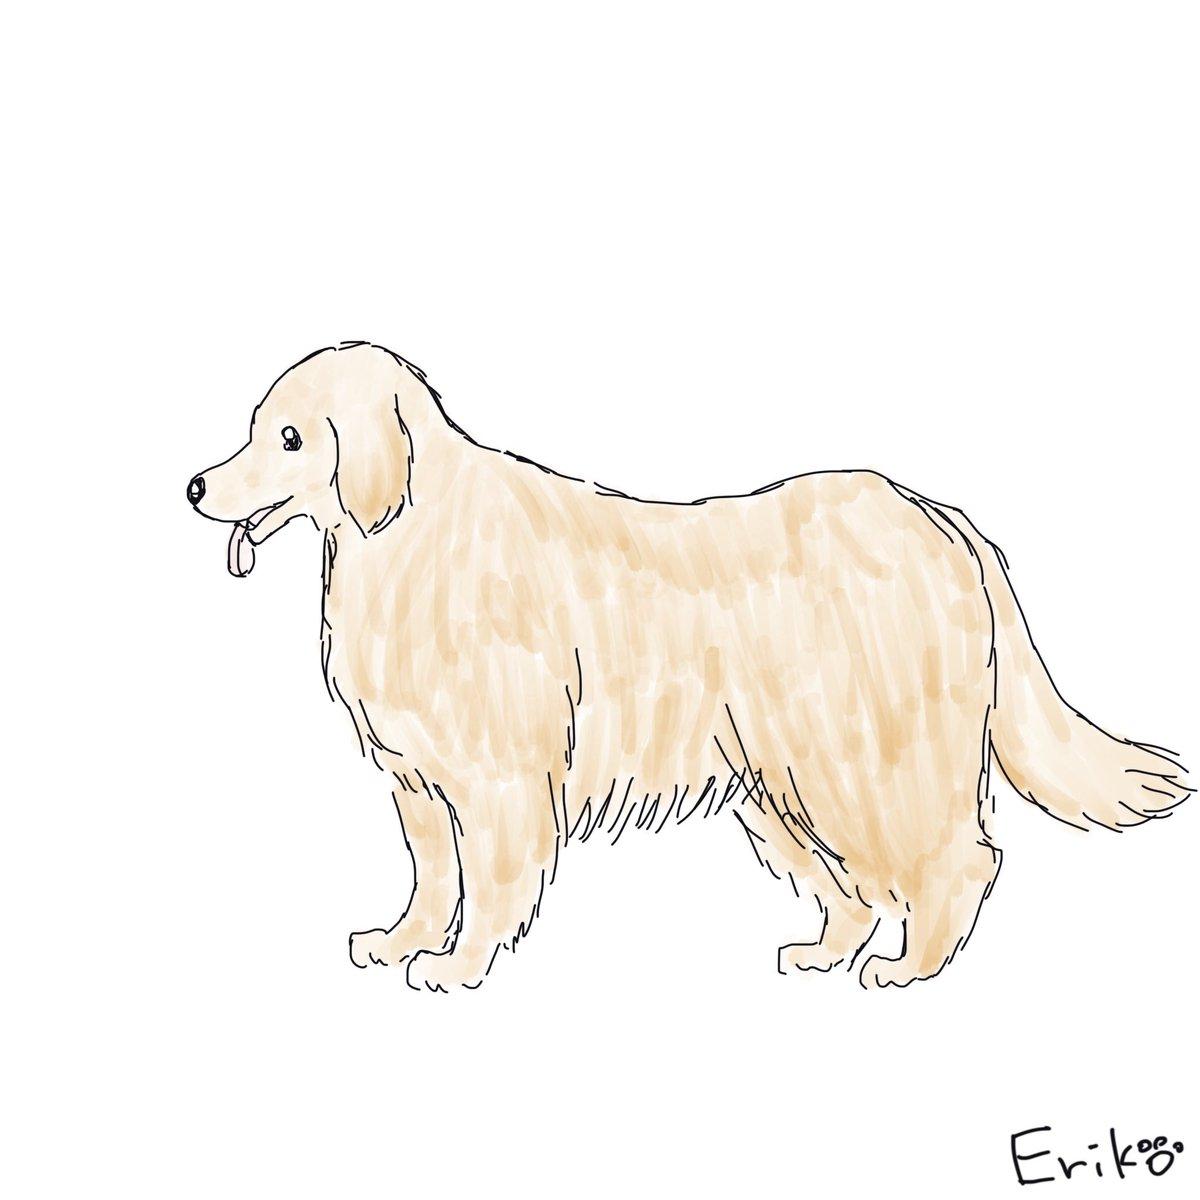 Dog Cat Sketch On Twitter ゴールデンレトリバー ゴールデン